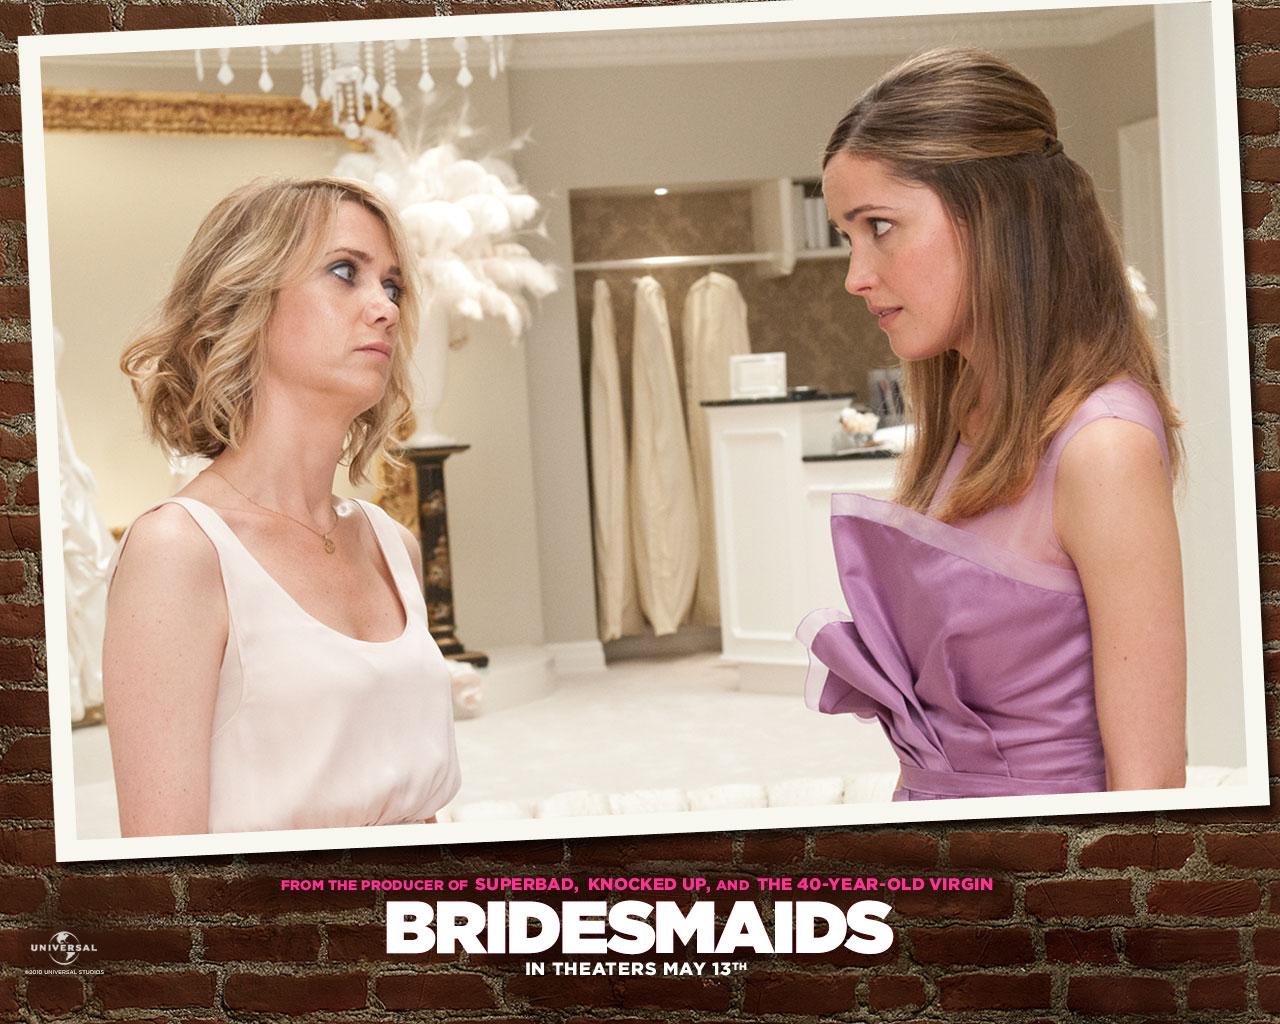 http://2.bp.blogspot.com/-LHX8Nds2mVE/TjQ2ARFyRJI/AAAAAAAAB4I/qqmB15X4gAc/s1600/Rose_Byrne_in_Bridesmaids_Wallpaper_5_1024.jpg